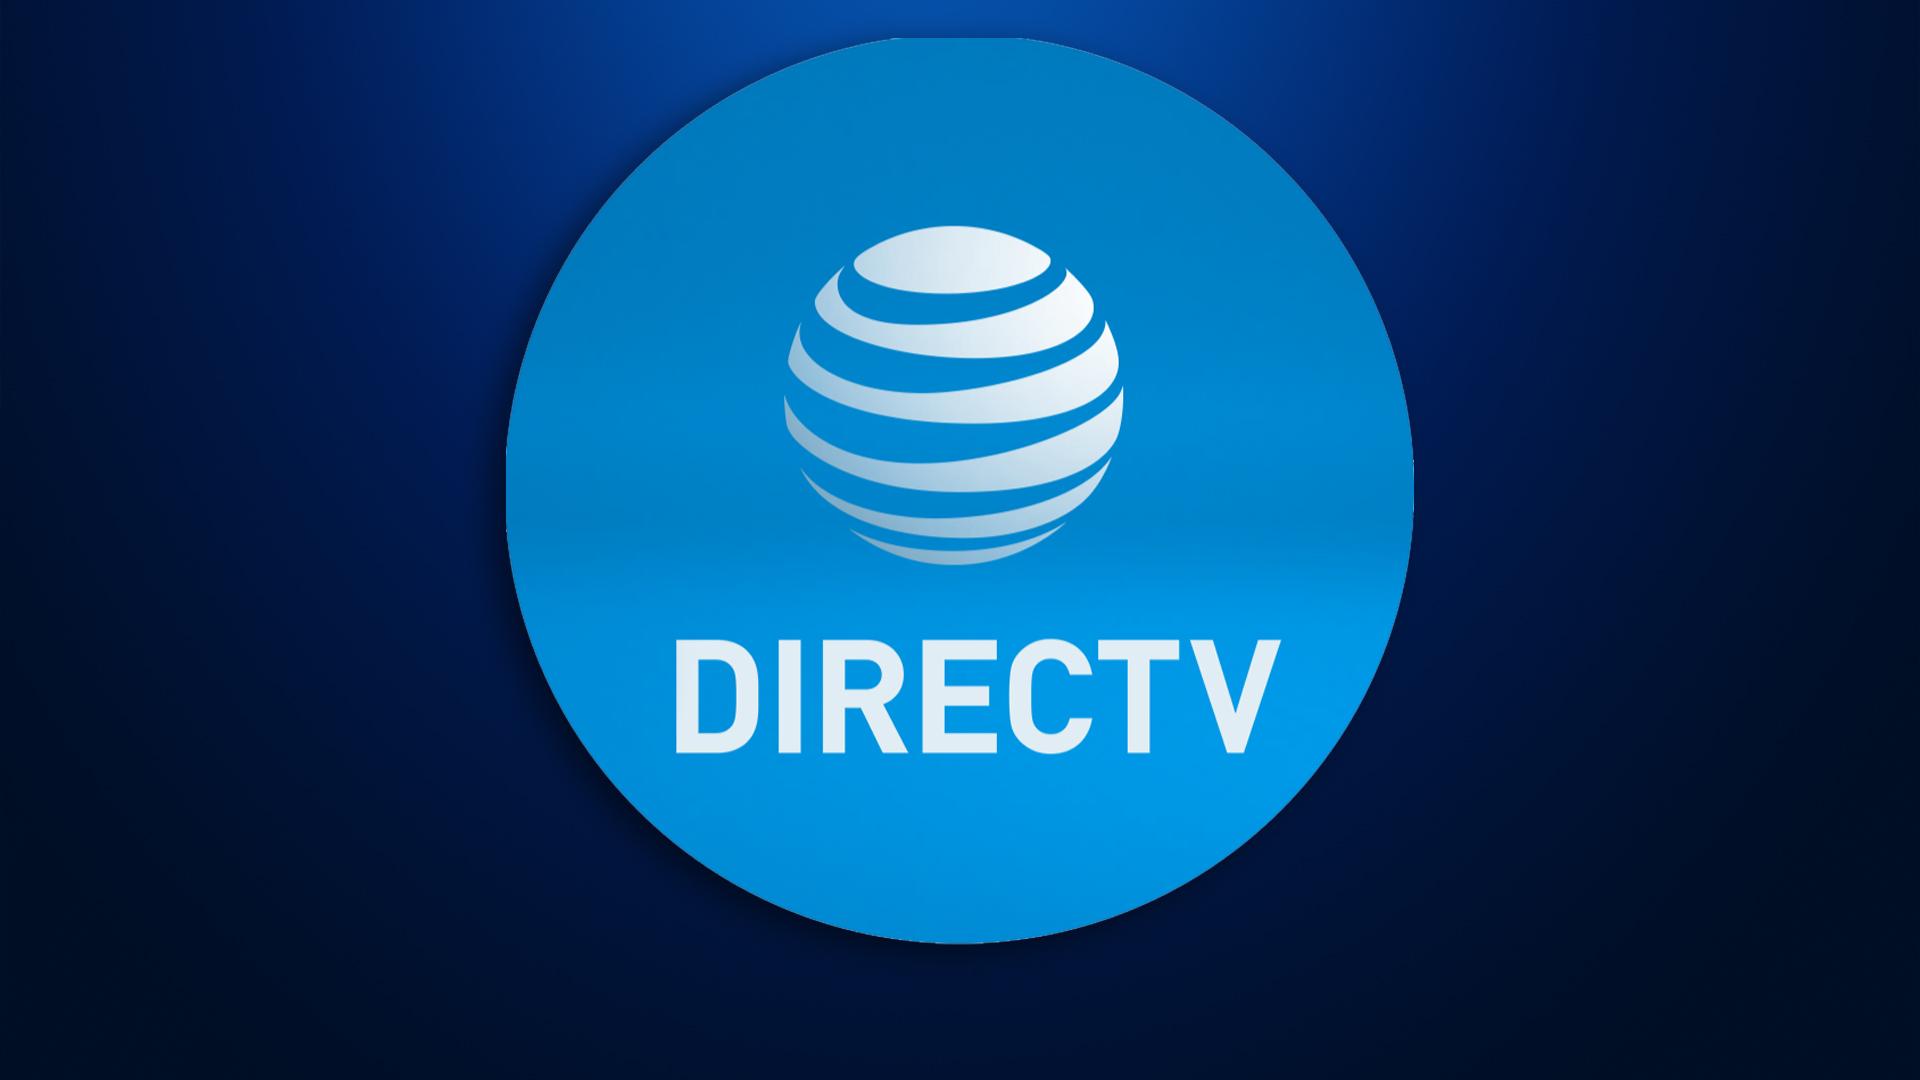 KELO Direct TV logo